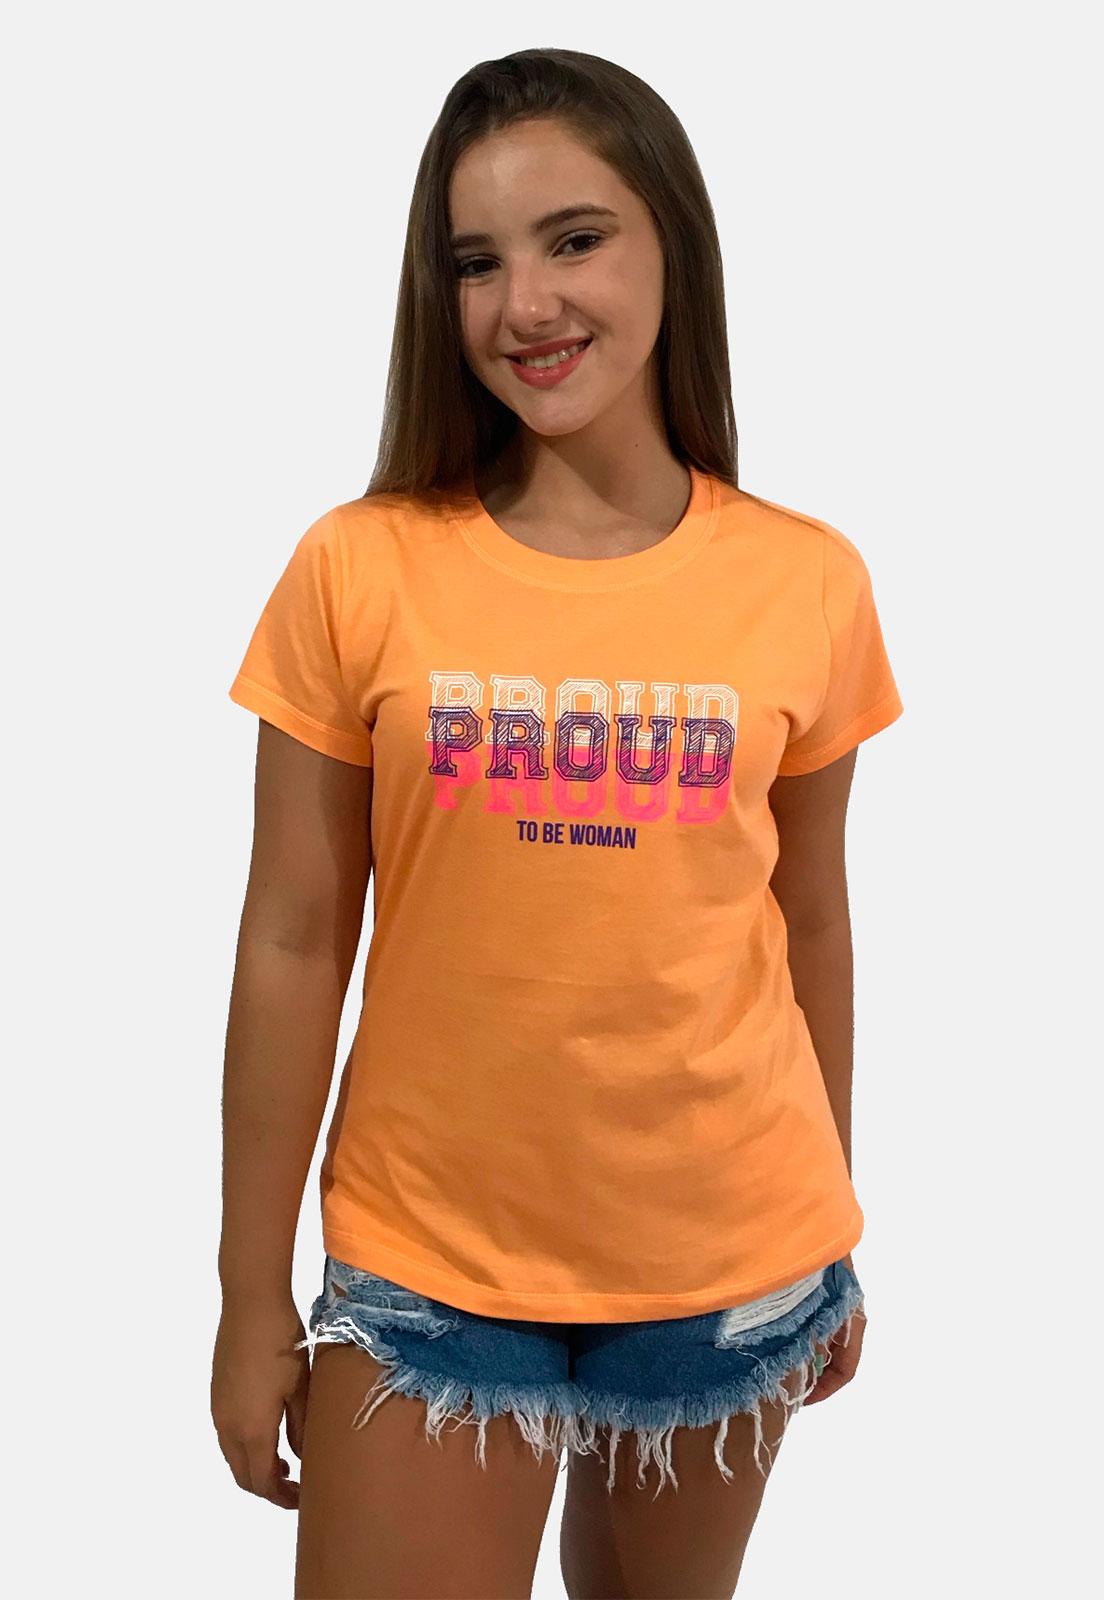 T-Shirt Camiseta Feminina